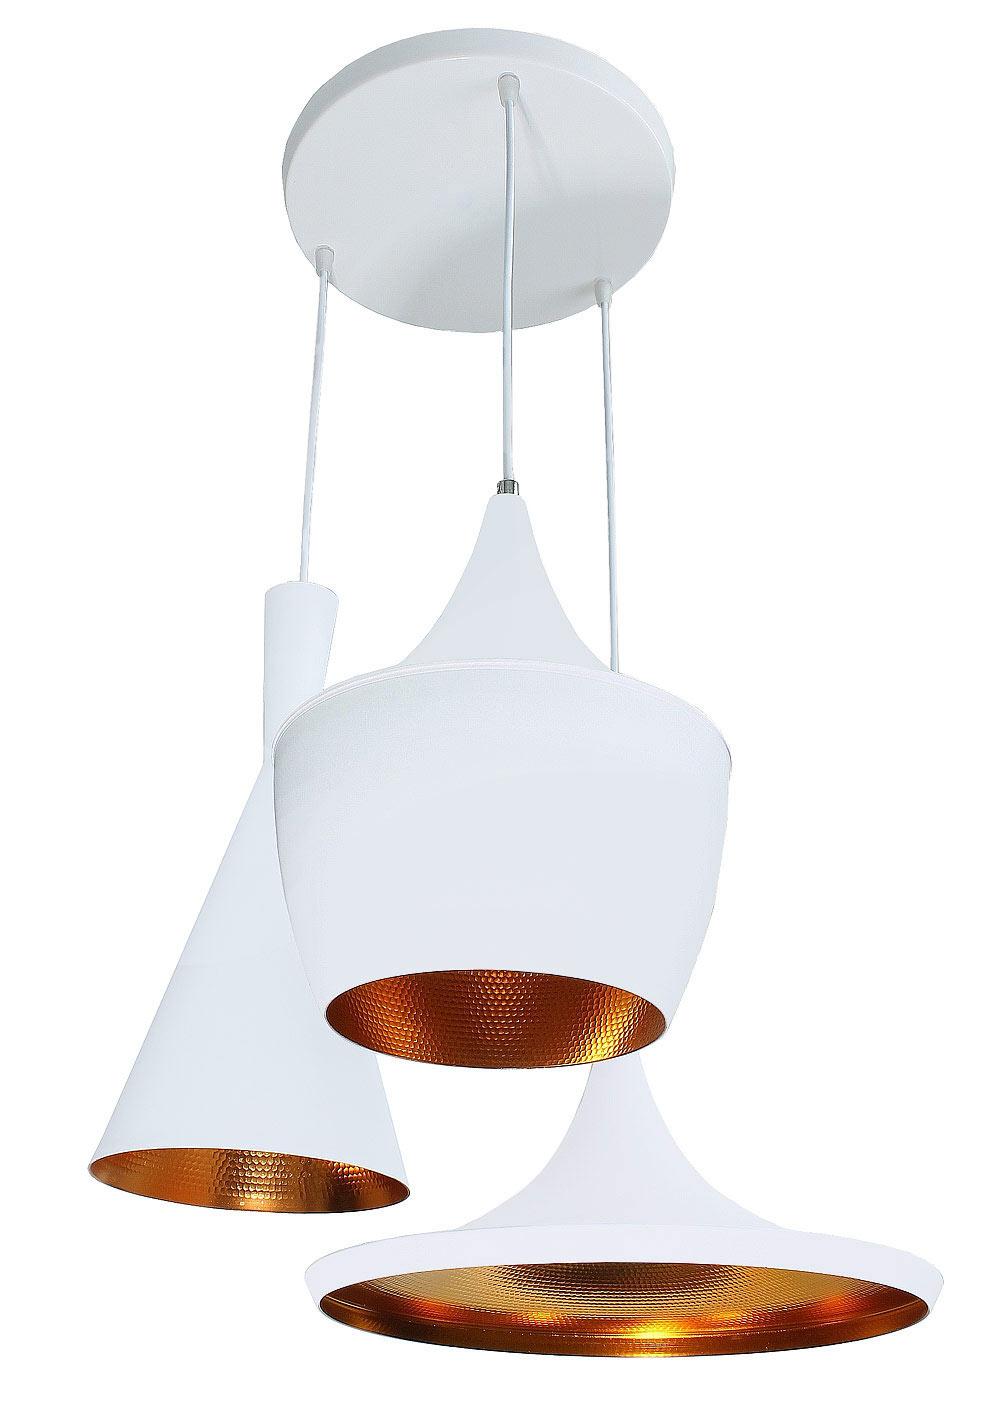 prívesok lampy, stropné lampy, biele zlato glamur luster